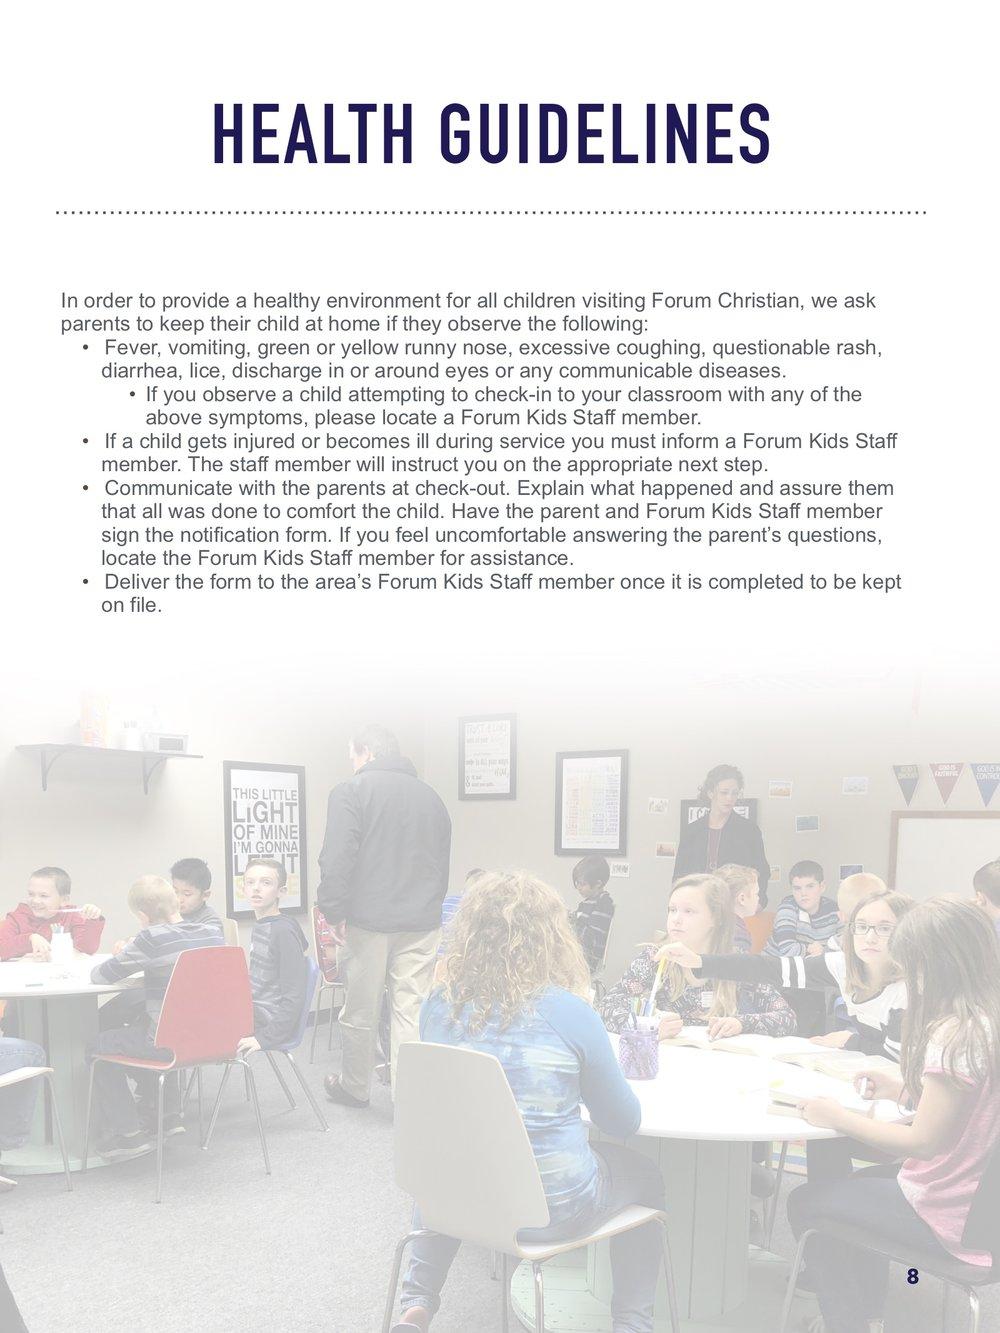 Forum Kids Policy Manual 8.jpg